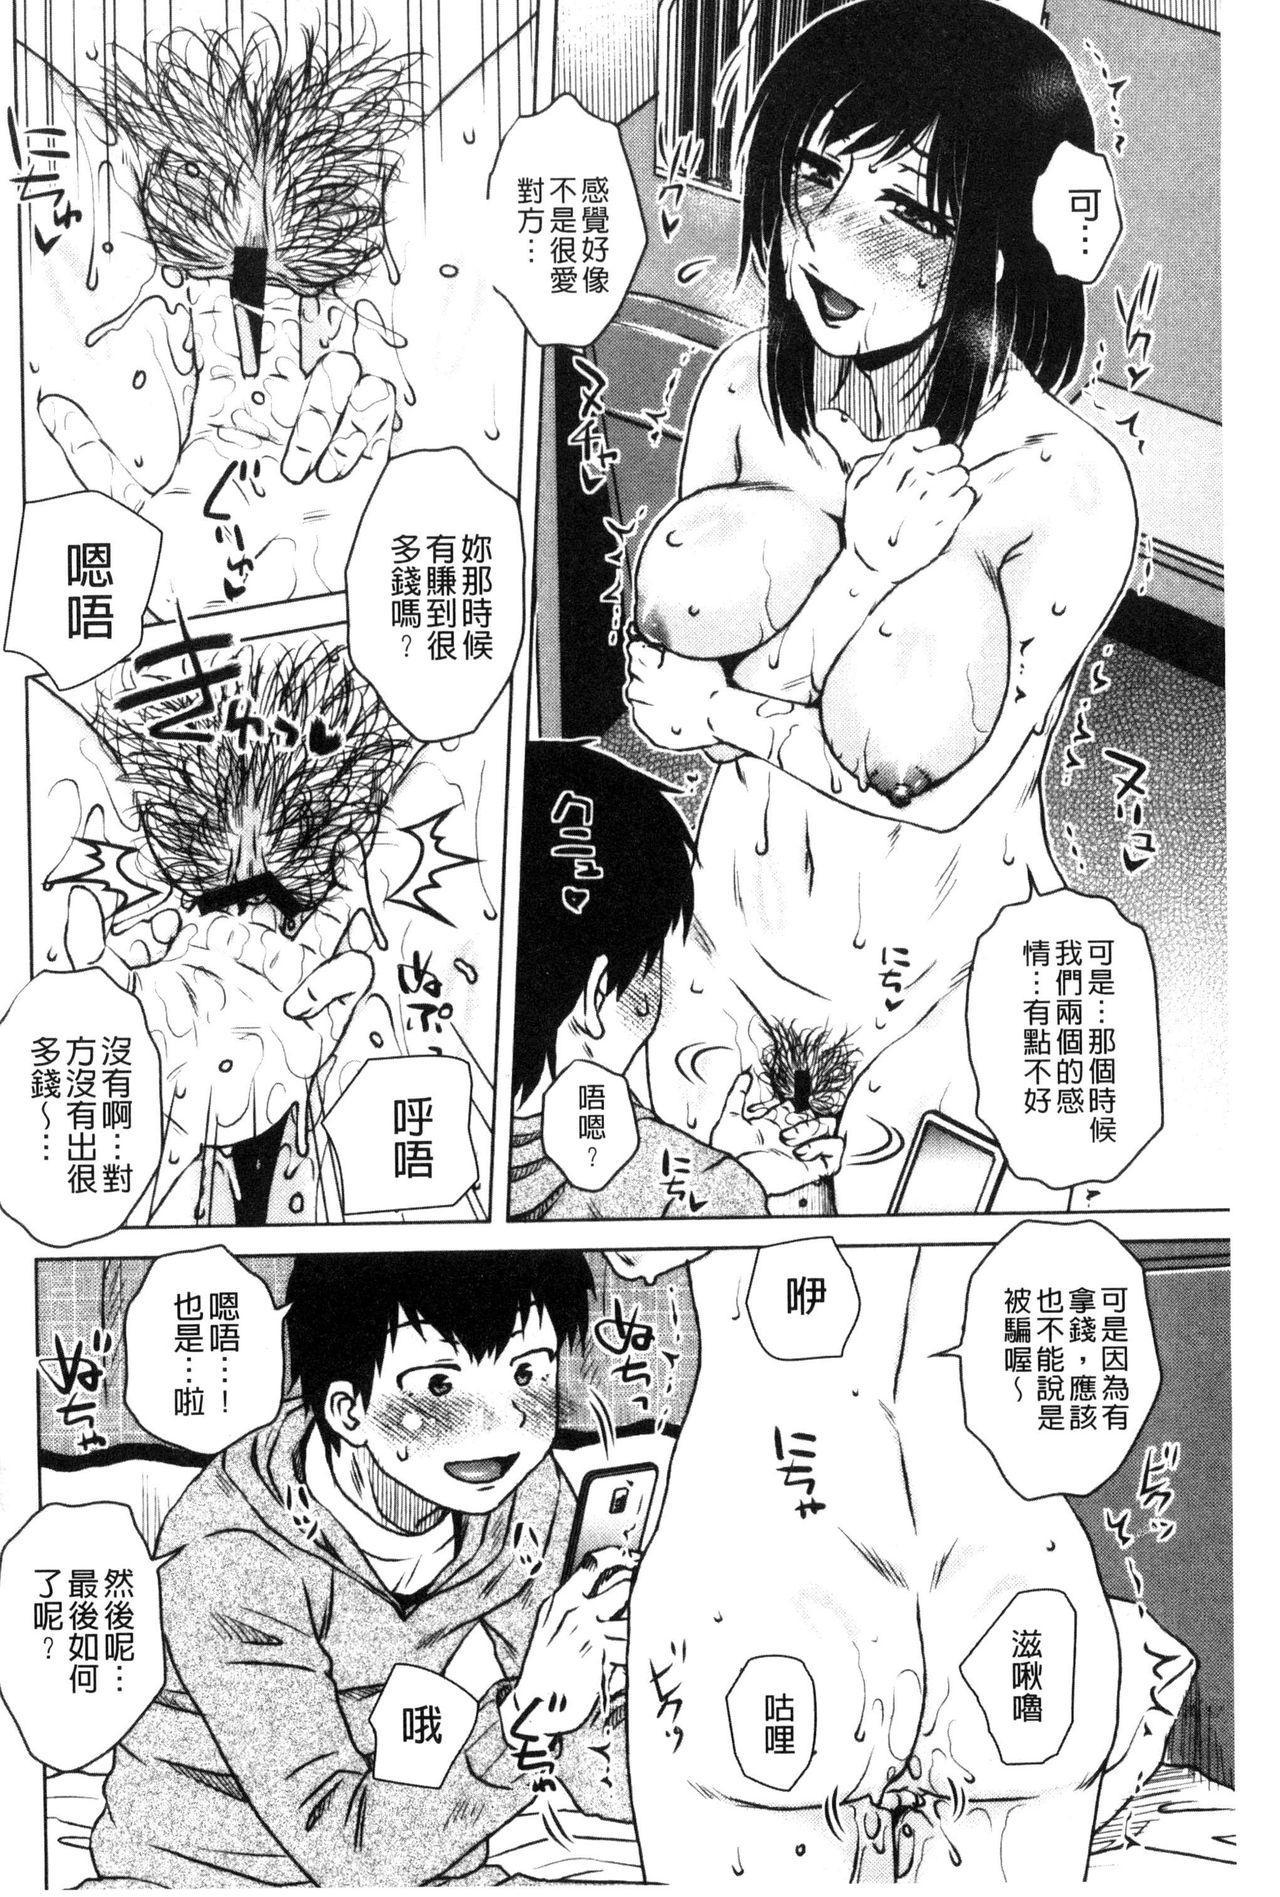 [Kurumiya Mashimin] Uchi no Shachou no Hamedere Inkatsu - Our President is HAME-DERE in Licentious sex life. [Chinese] 134